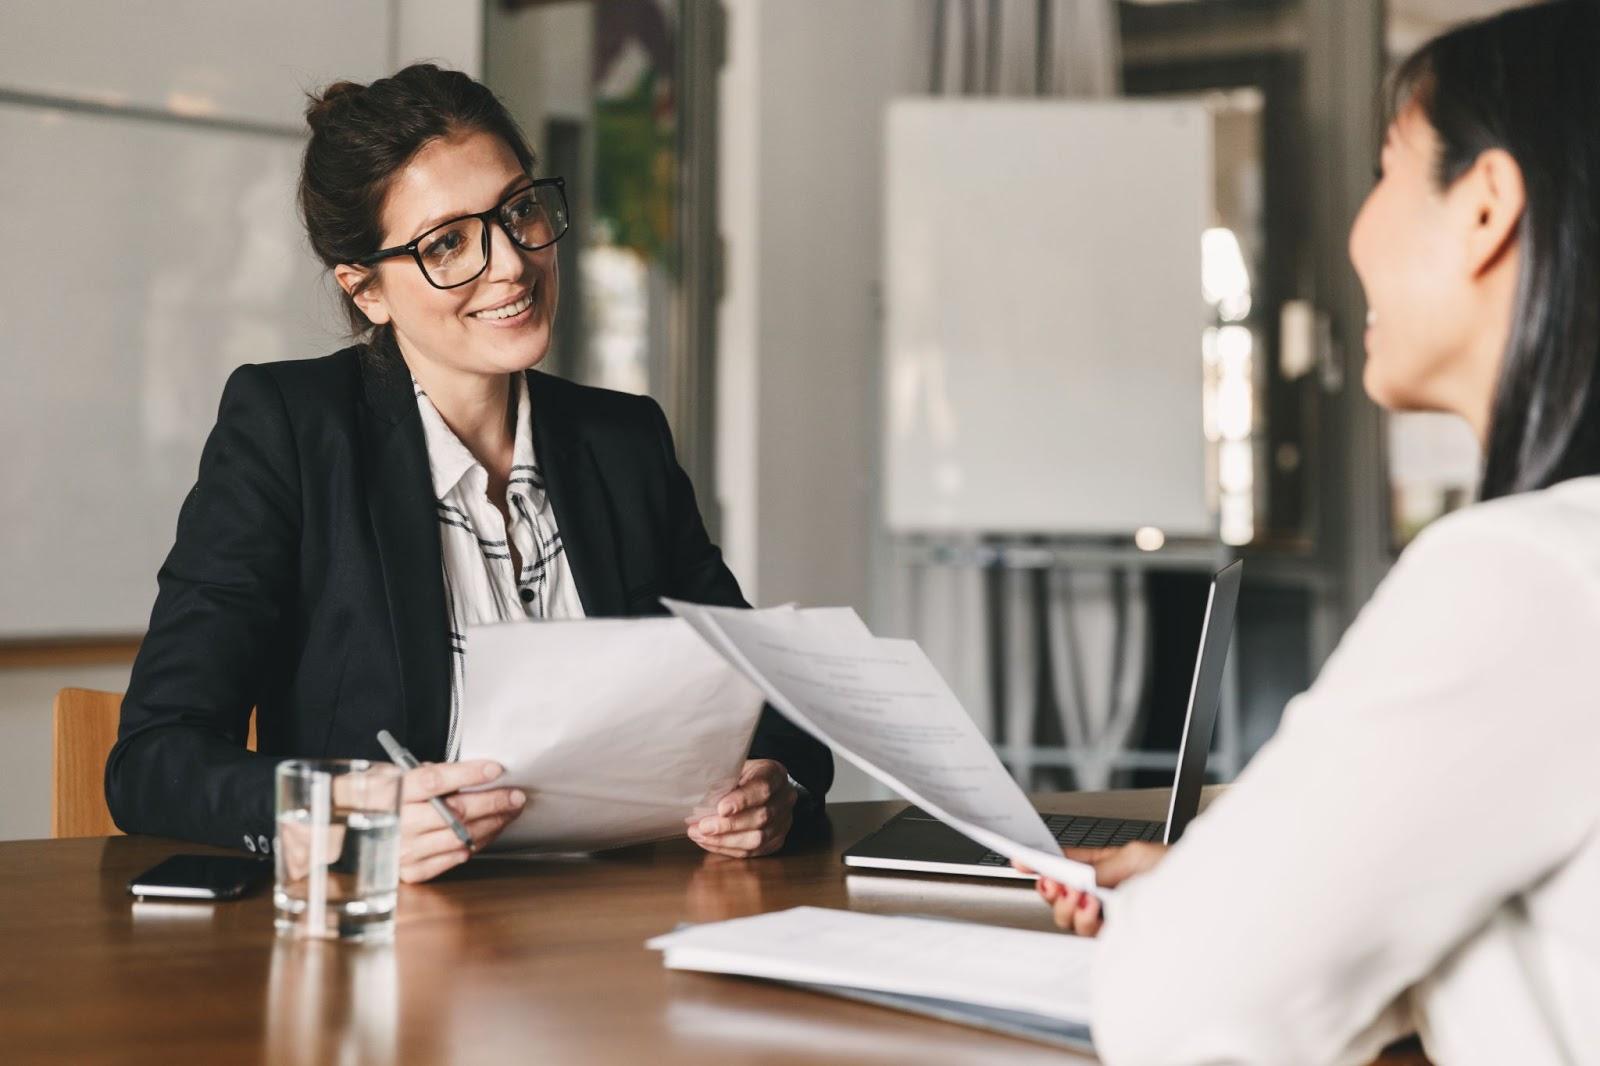 Aspectele importante de care sa tii cont inainte sa aplici pentru un job